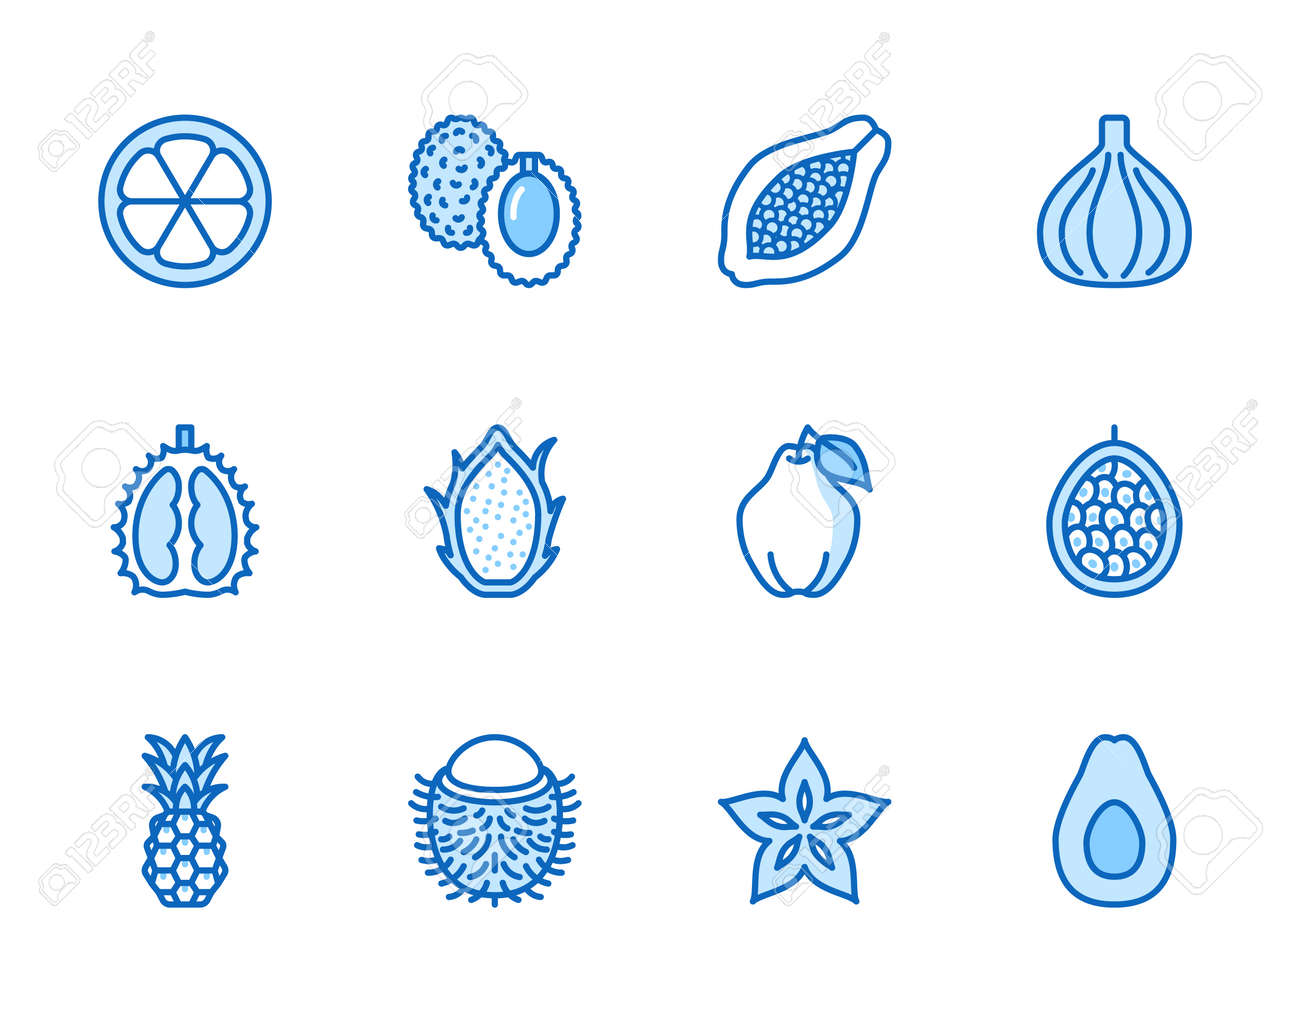 Exotic fruits, berry flat line icons set. Papaya, dragon fruit, rambutan, fig, mangosteen, avocado, starfruit vector illustrations. Outline signs for tropical food store. Blue color, Editable Stroke. - 162491645